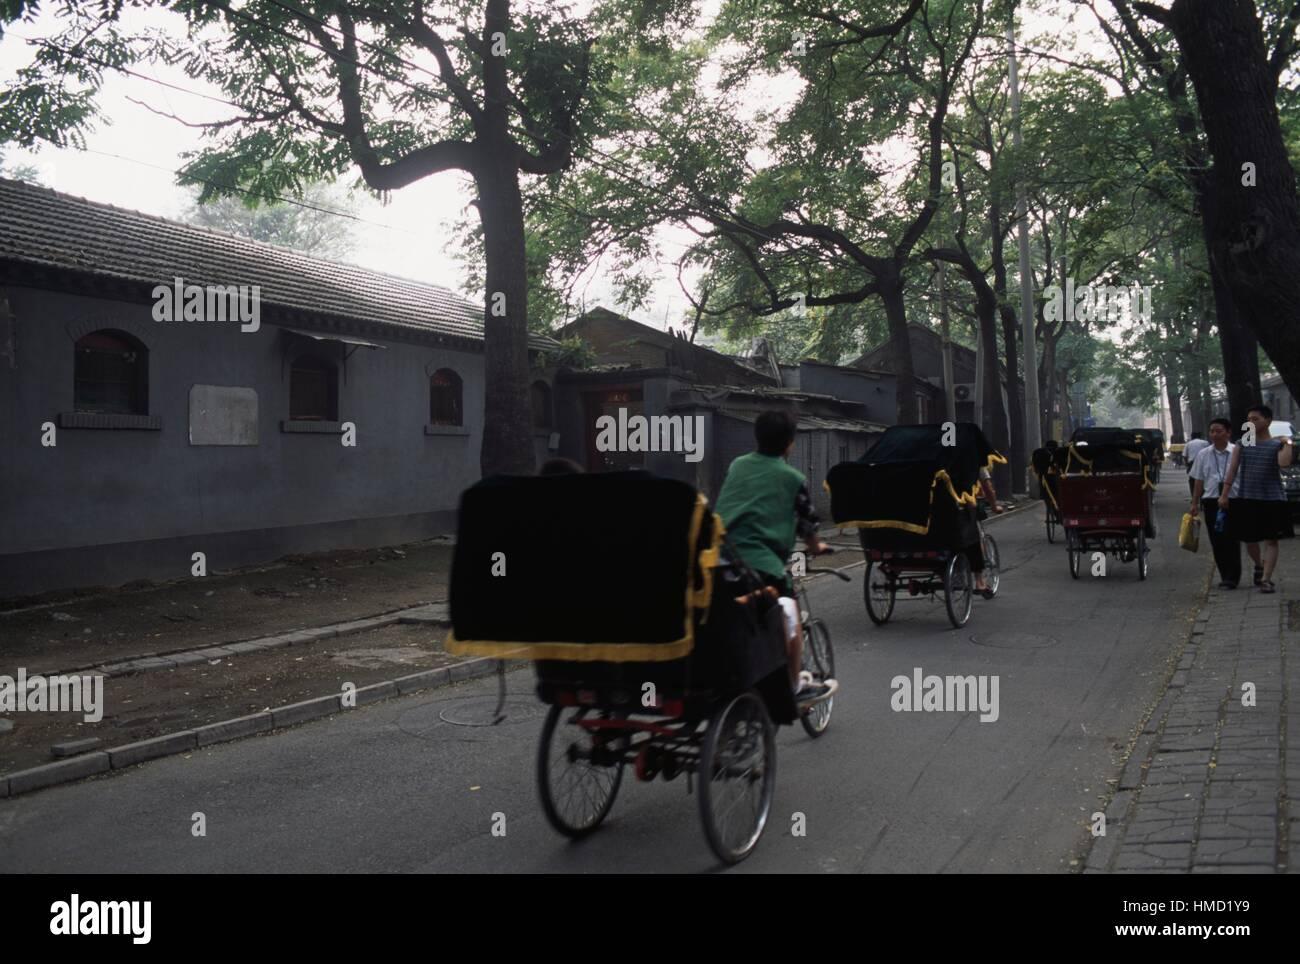 Rickshaw, Shichahai Lake, Beijing, China. - Stock Image